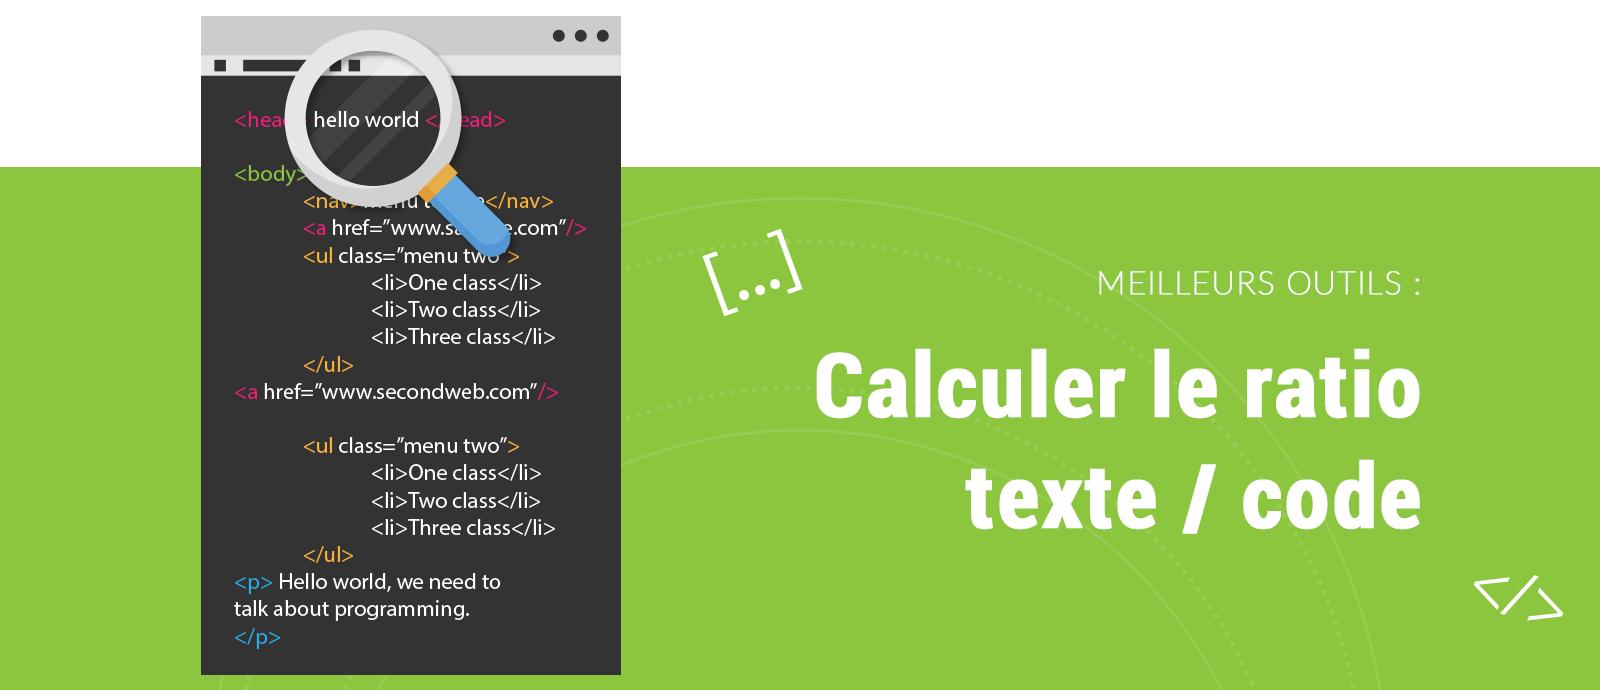 Outil pour calculer le ratio texte code